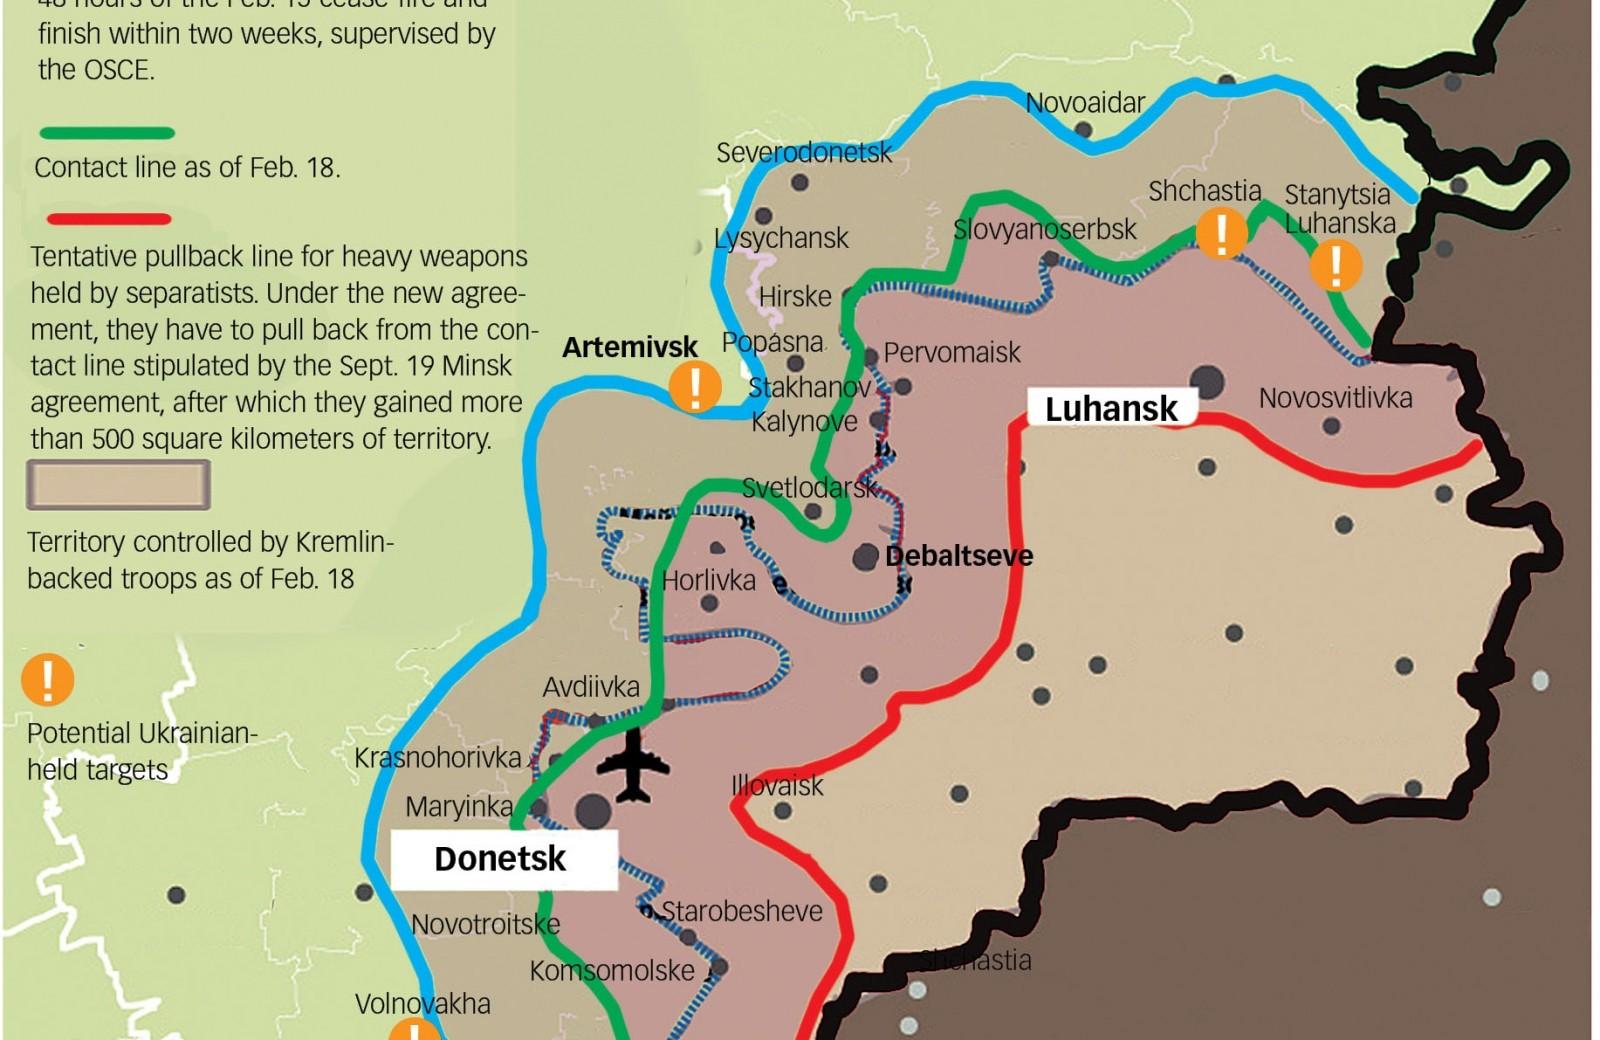 Severodonetsk: a selection of sites